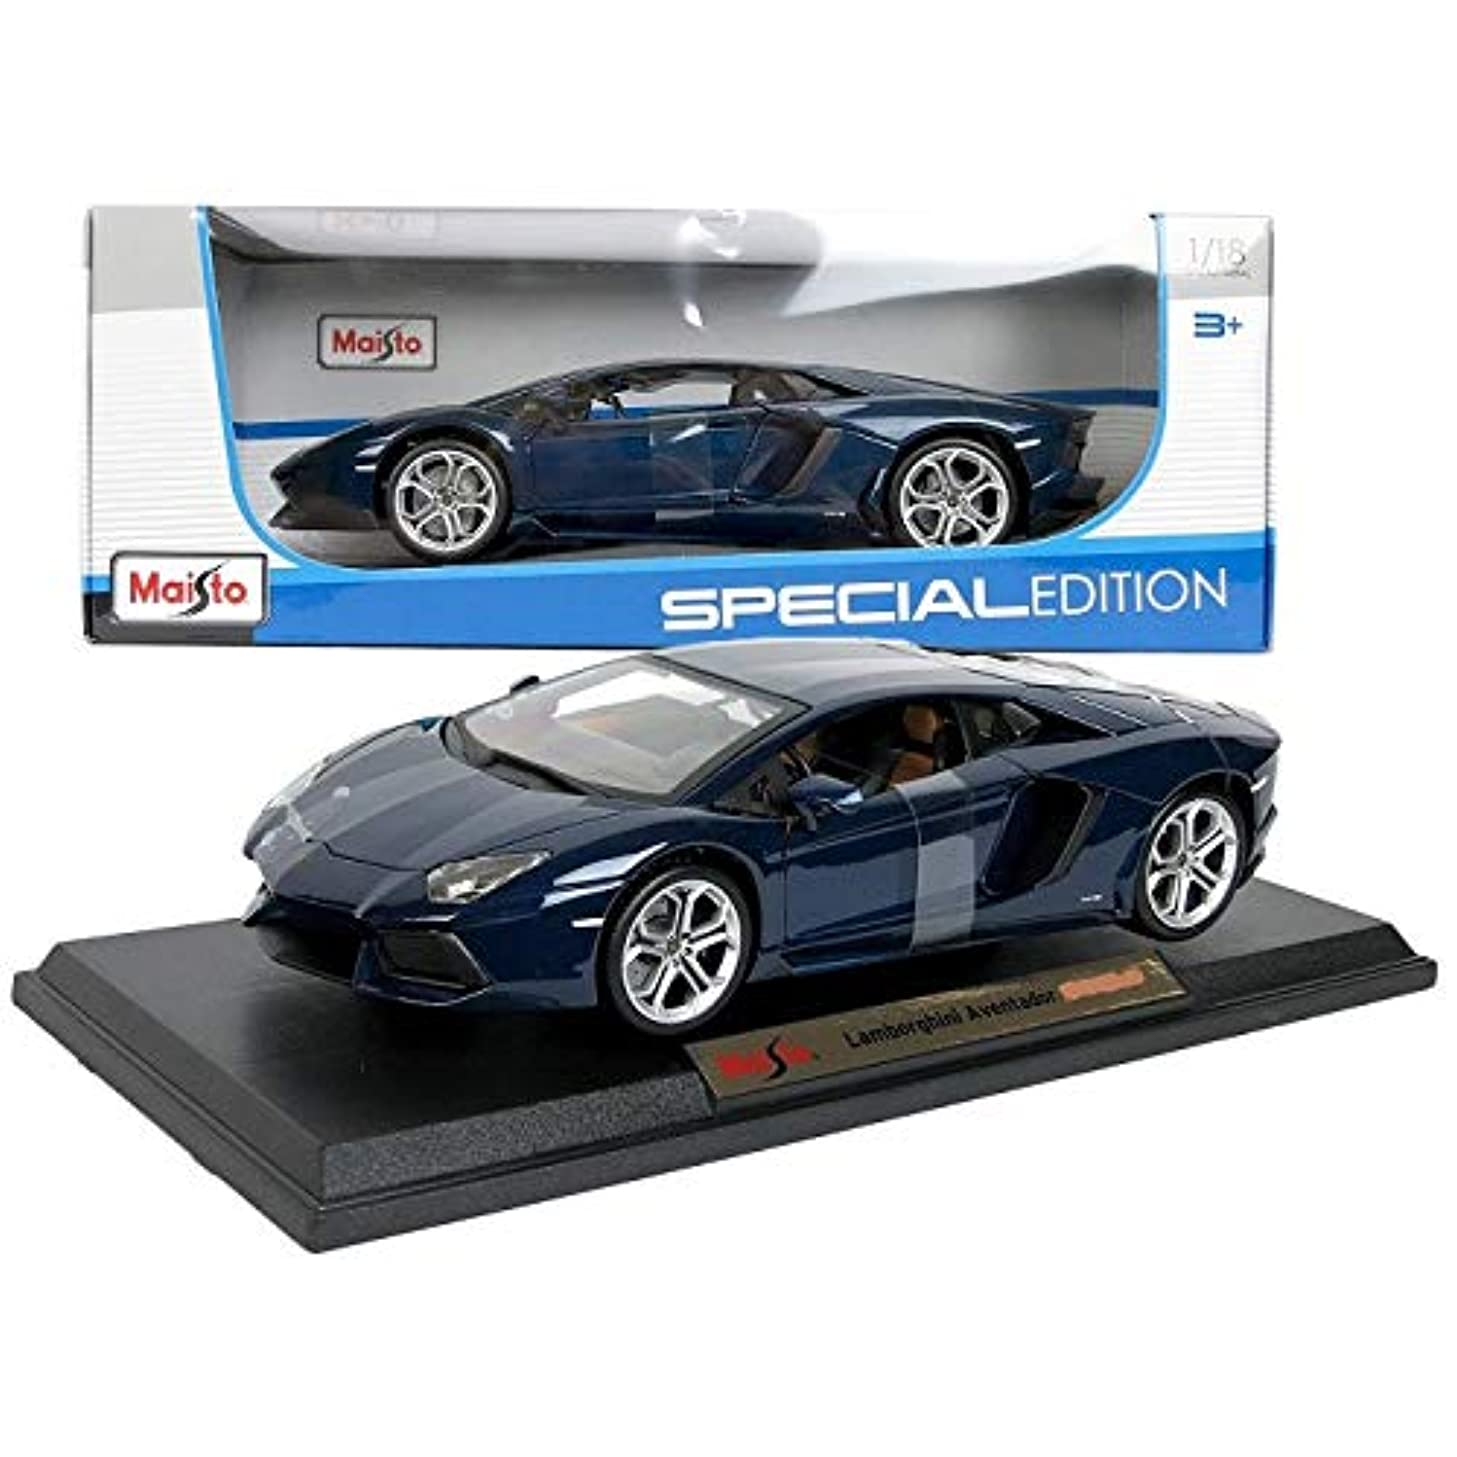 Maisto 1:18 Aventador Coupe Blue Diecast Car Model Vehicle Window Box